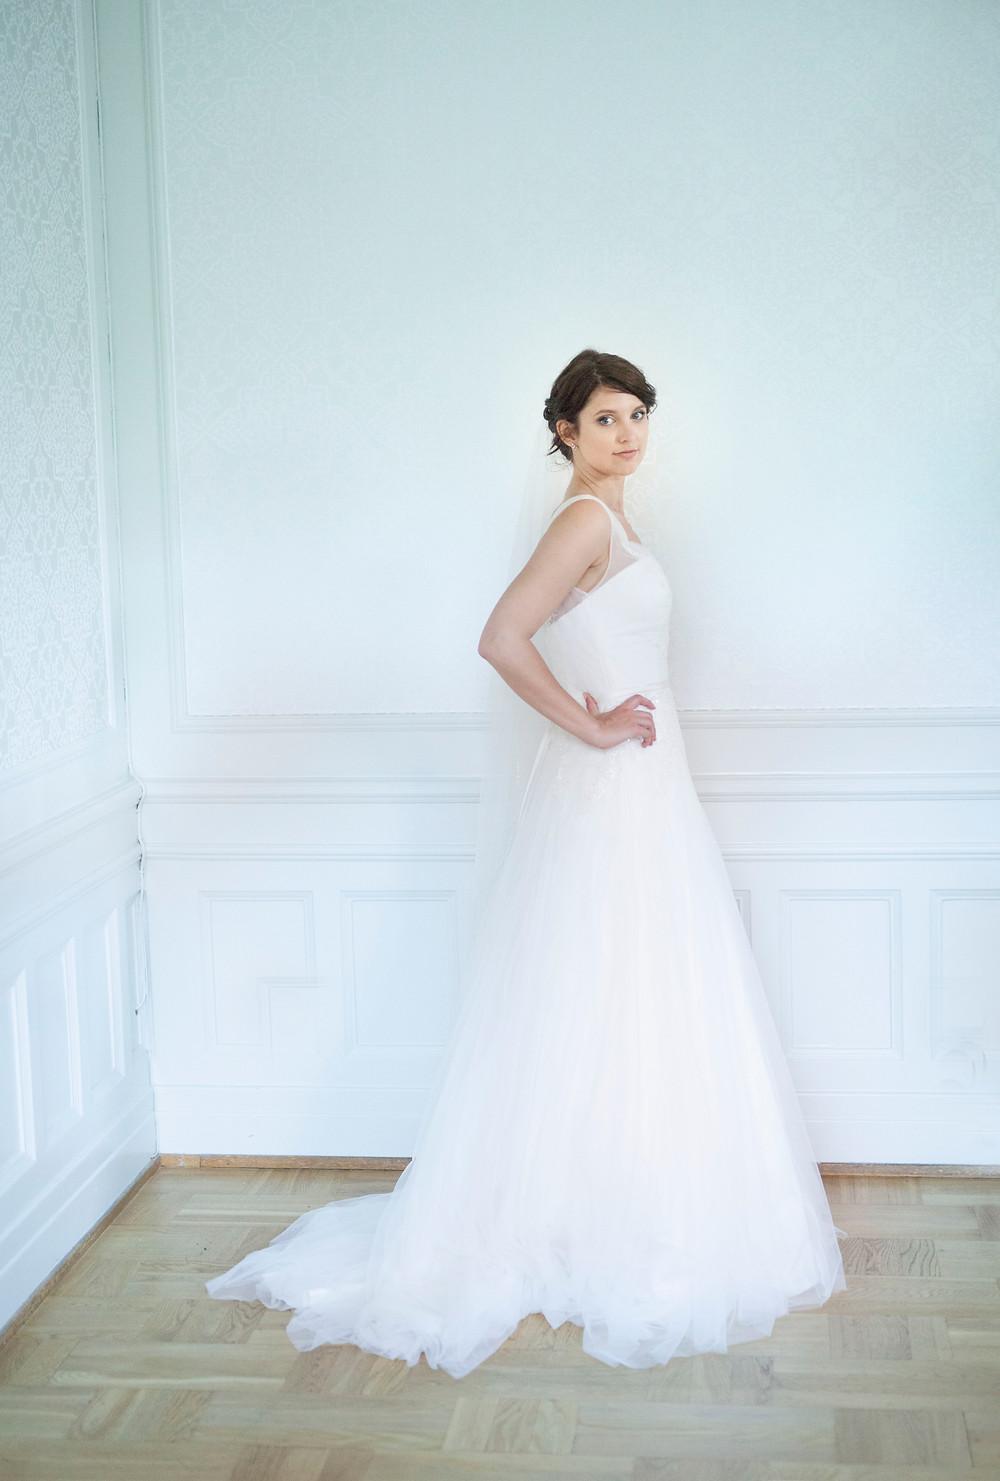 weddingphotographer stockholm